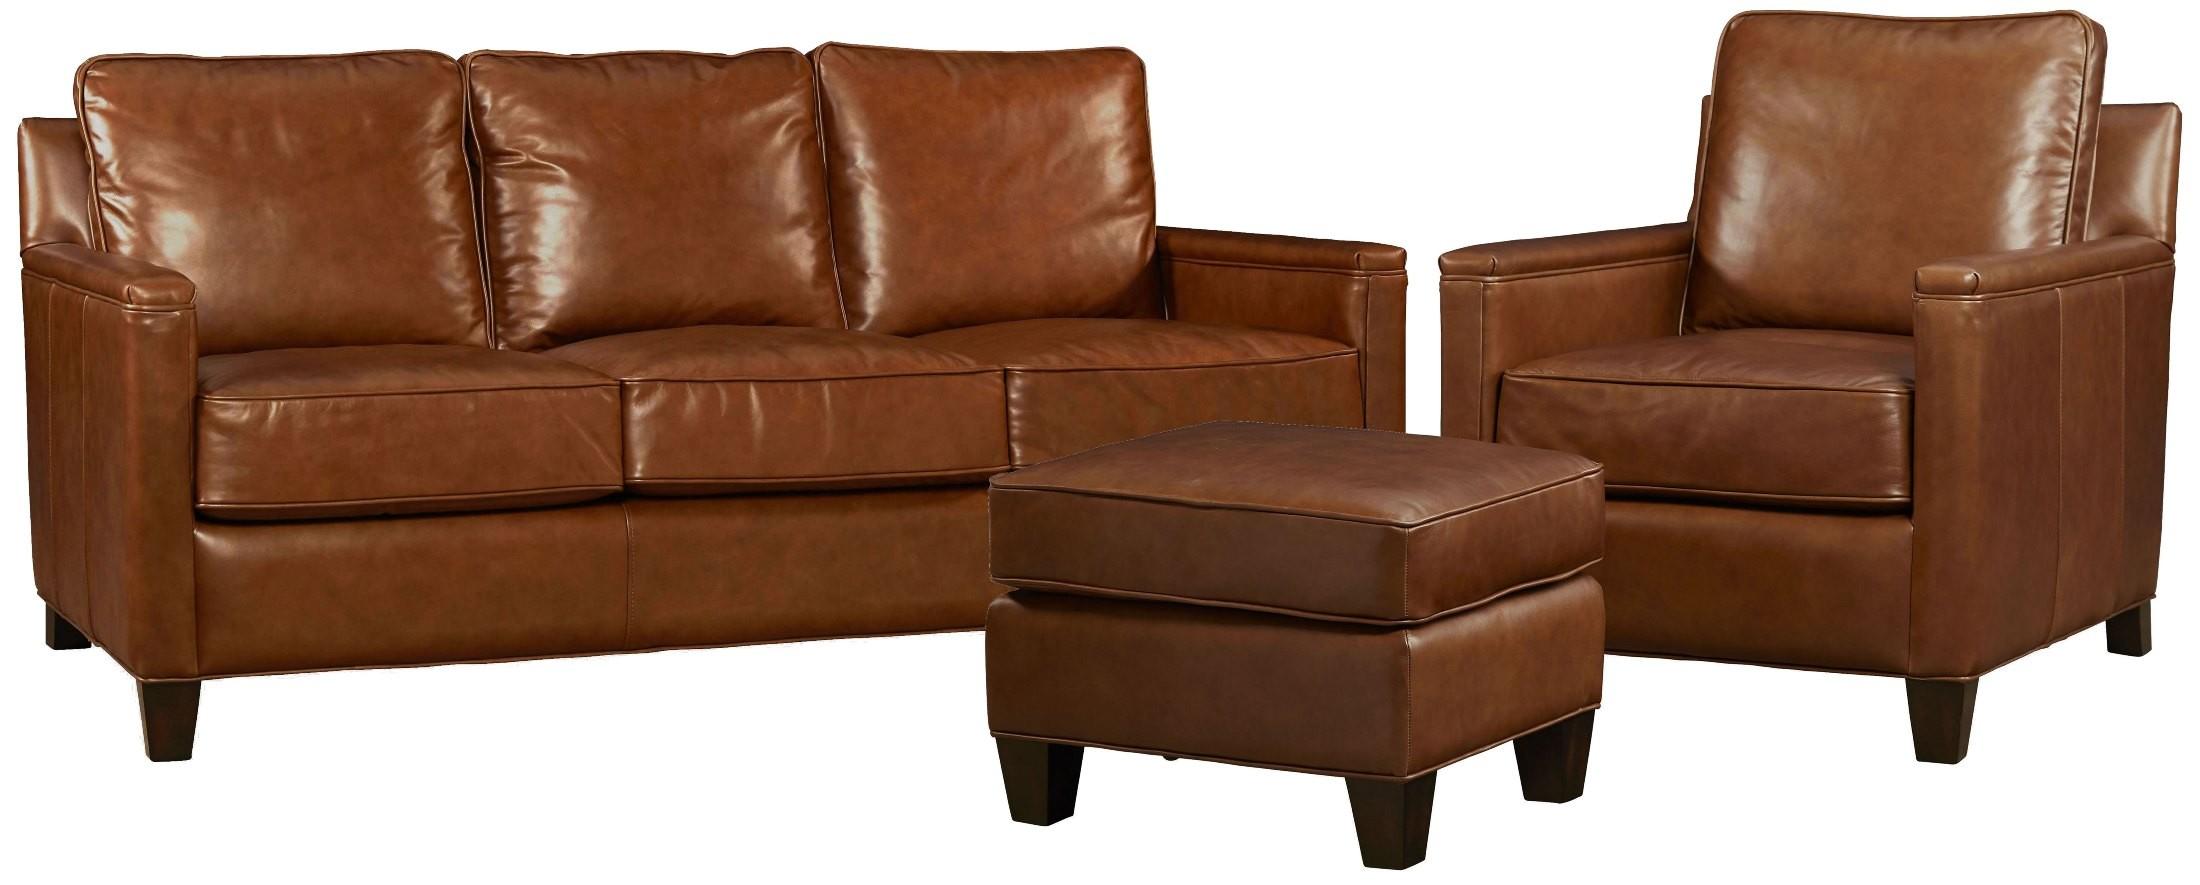 alexander berkshire maple living room set from palatial furniture coleman furniture